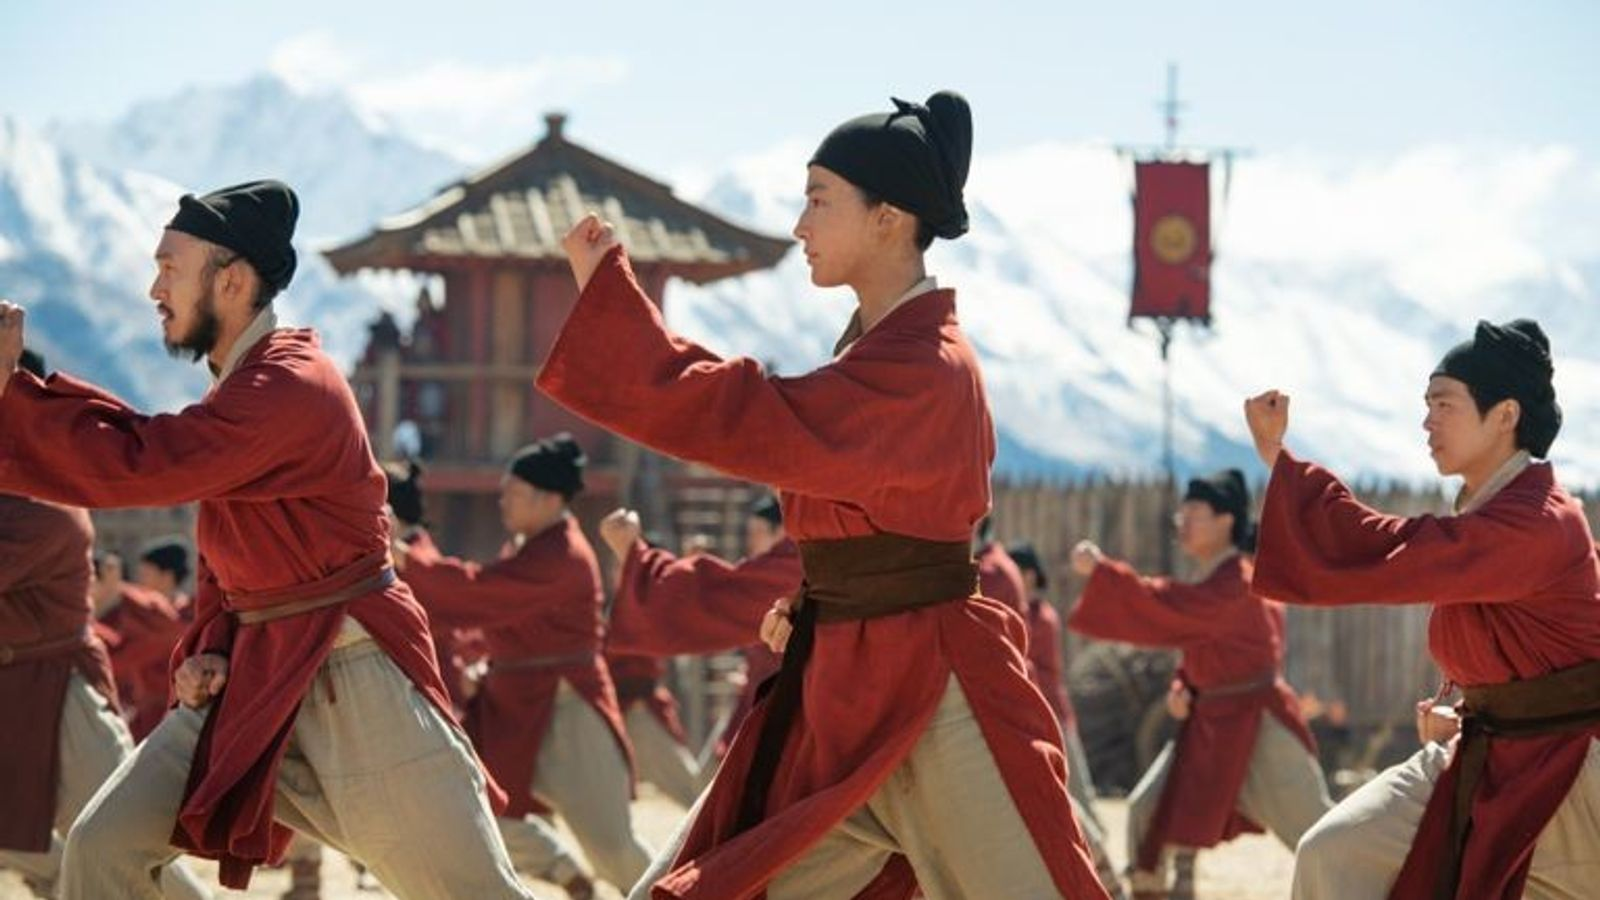 Liu Yifei als Hua Mulan